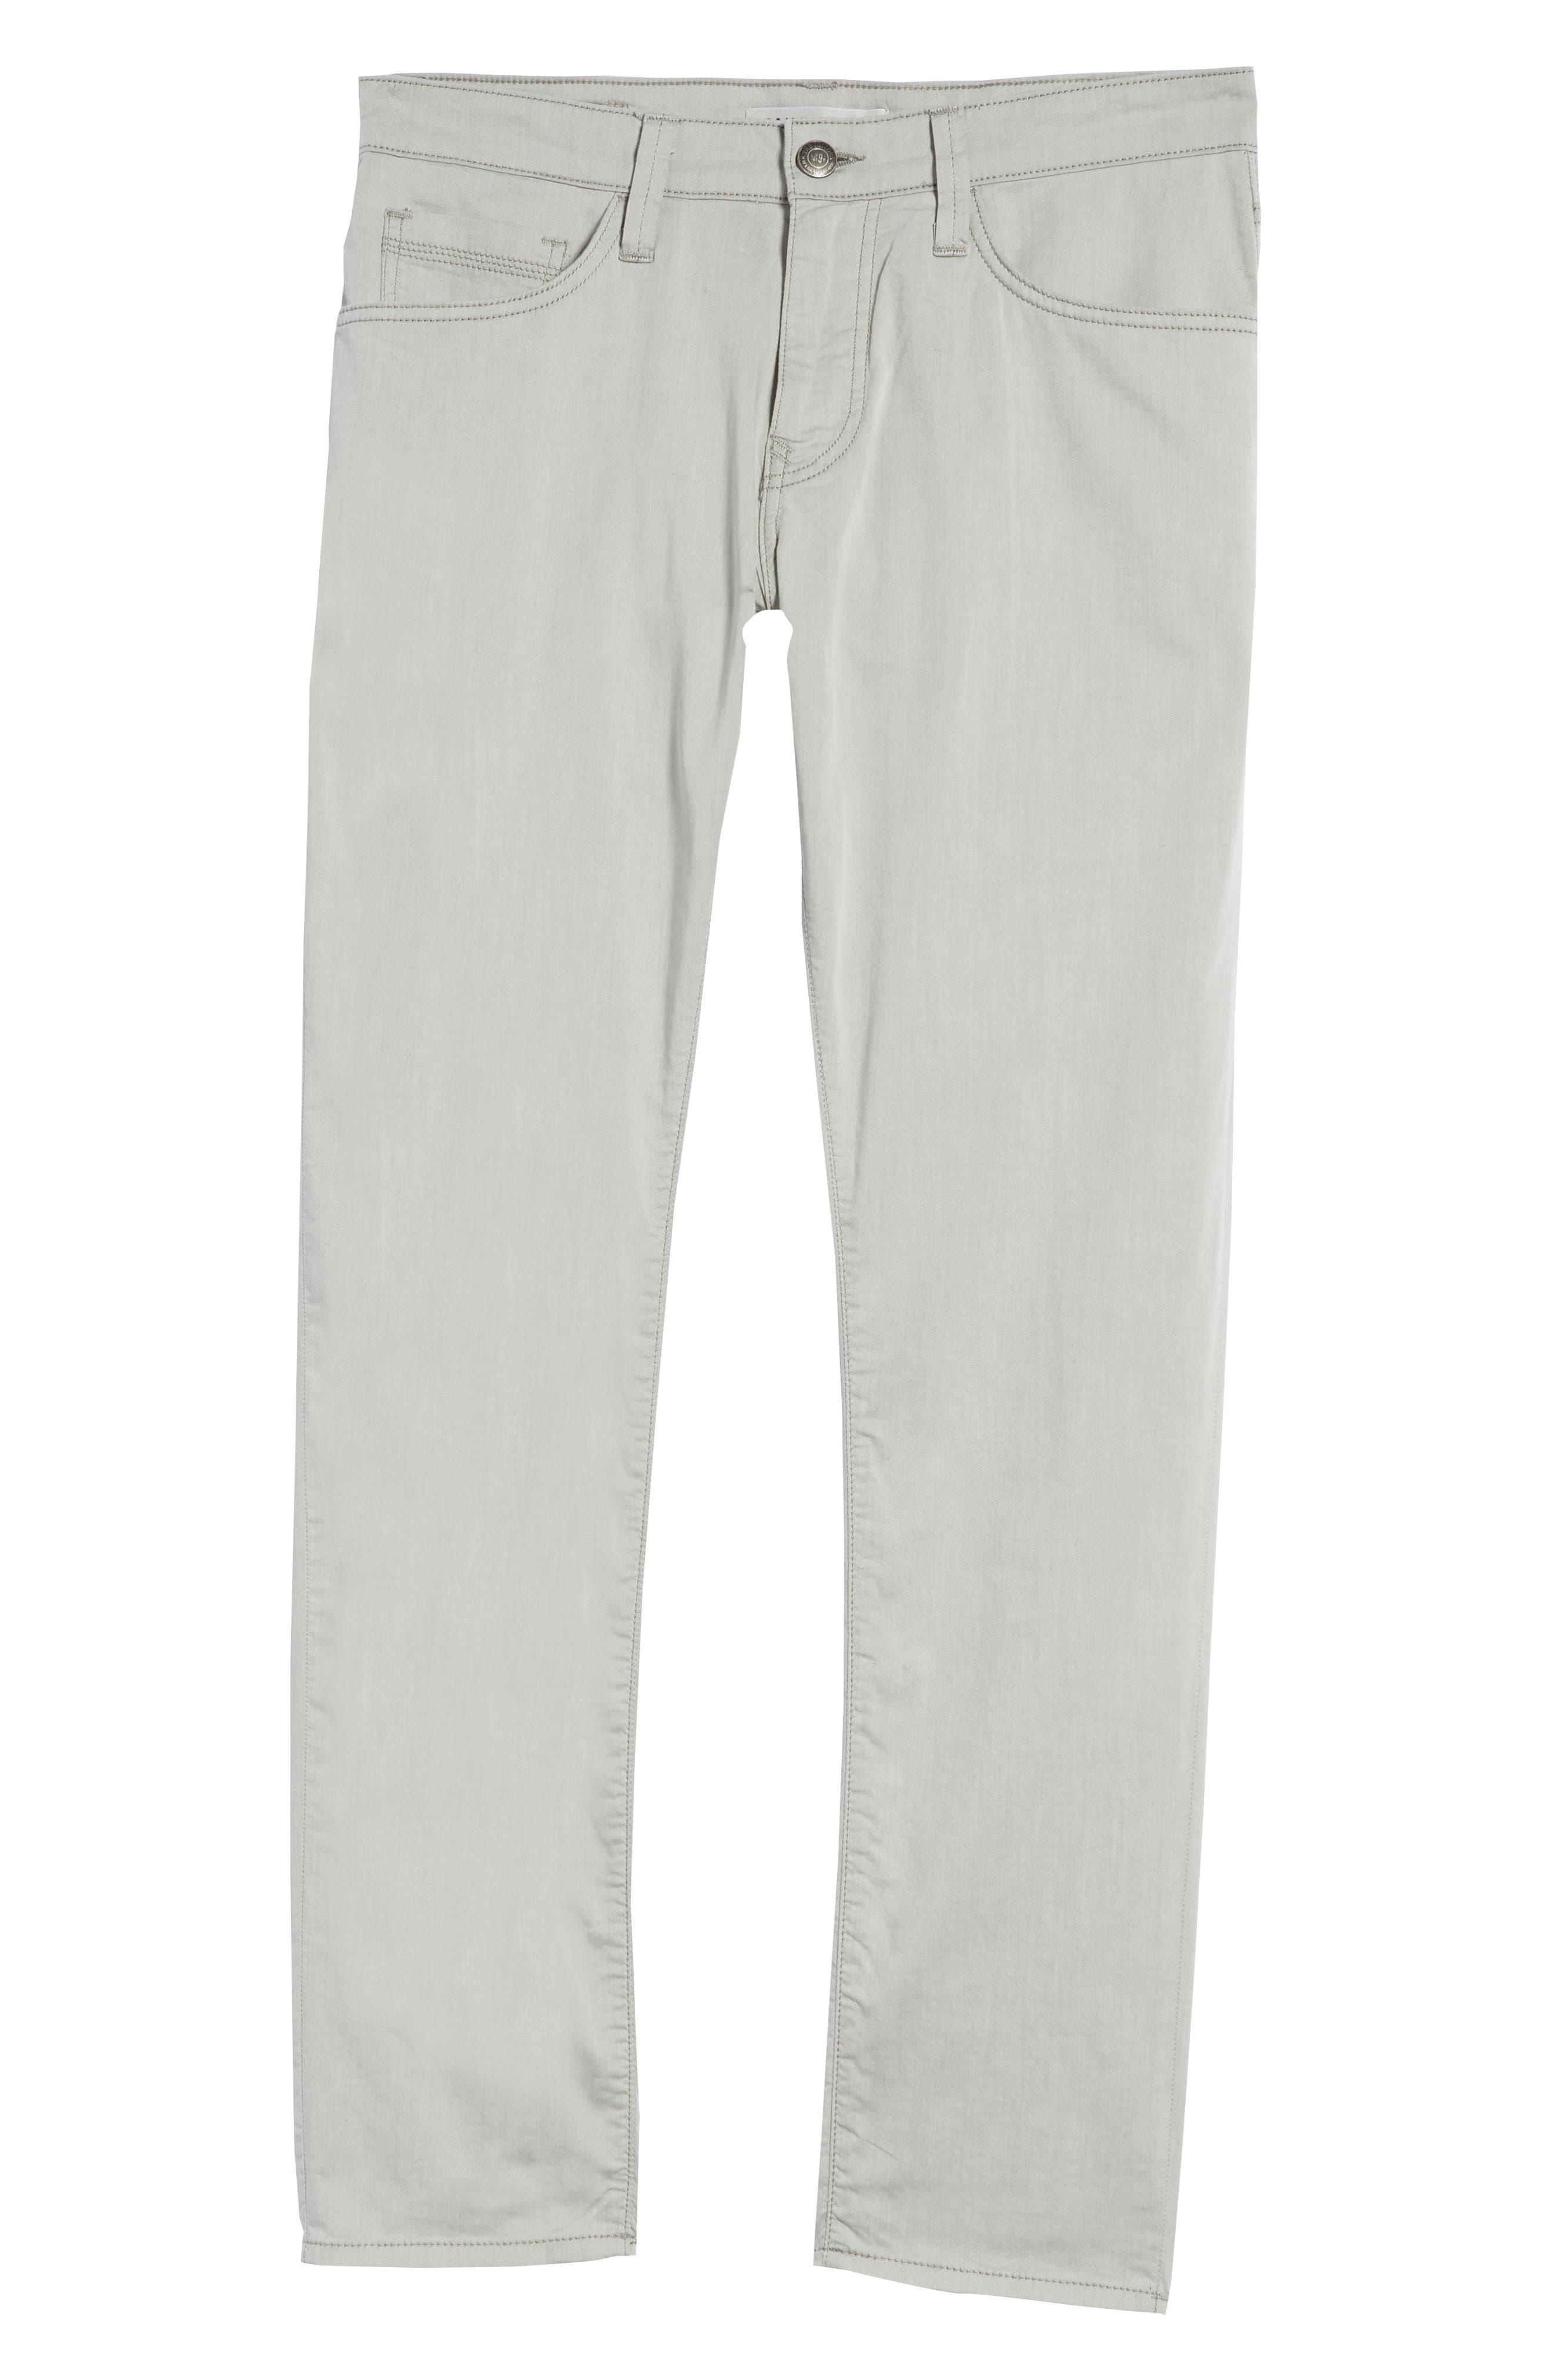 Jake Slim Fit Jeans,                             Alternate thumbnail 6, color,                             Latte Reversed